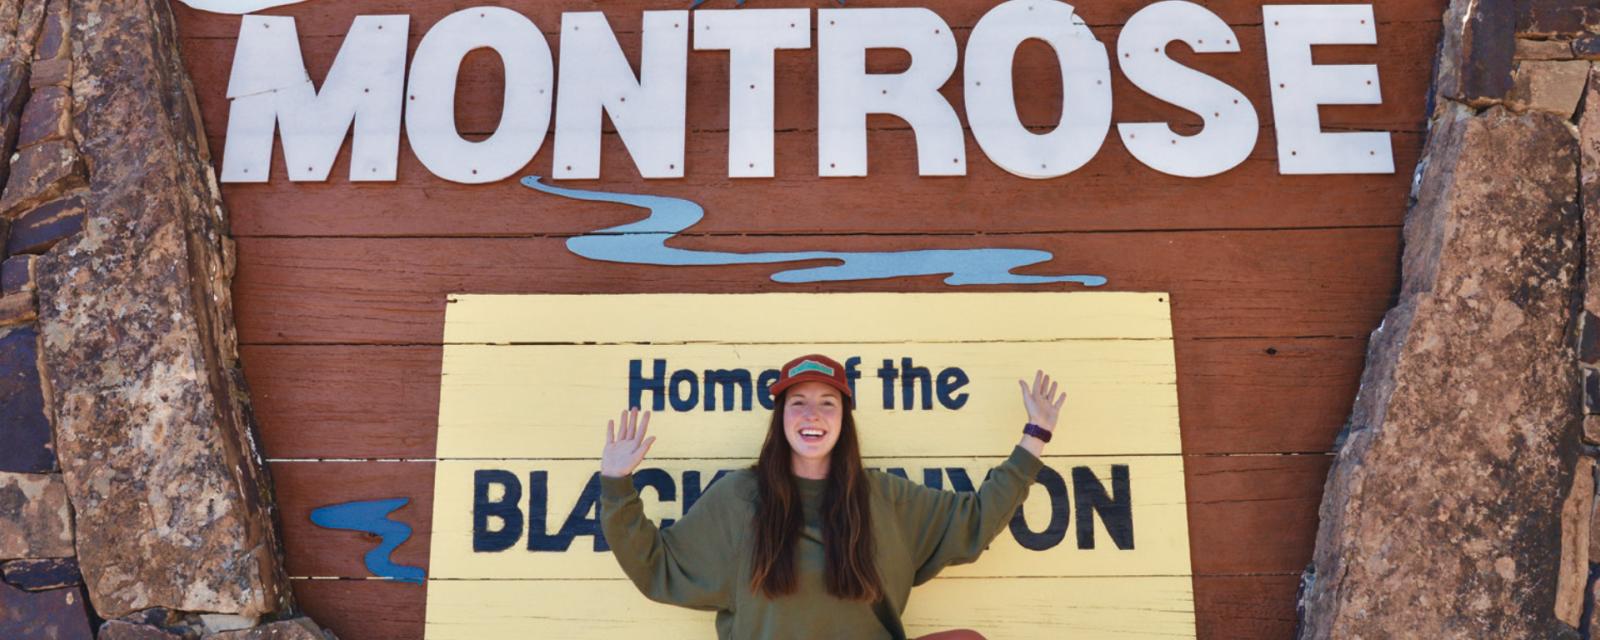 Relocate to Montrose, Colorado